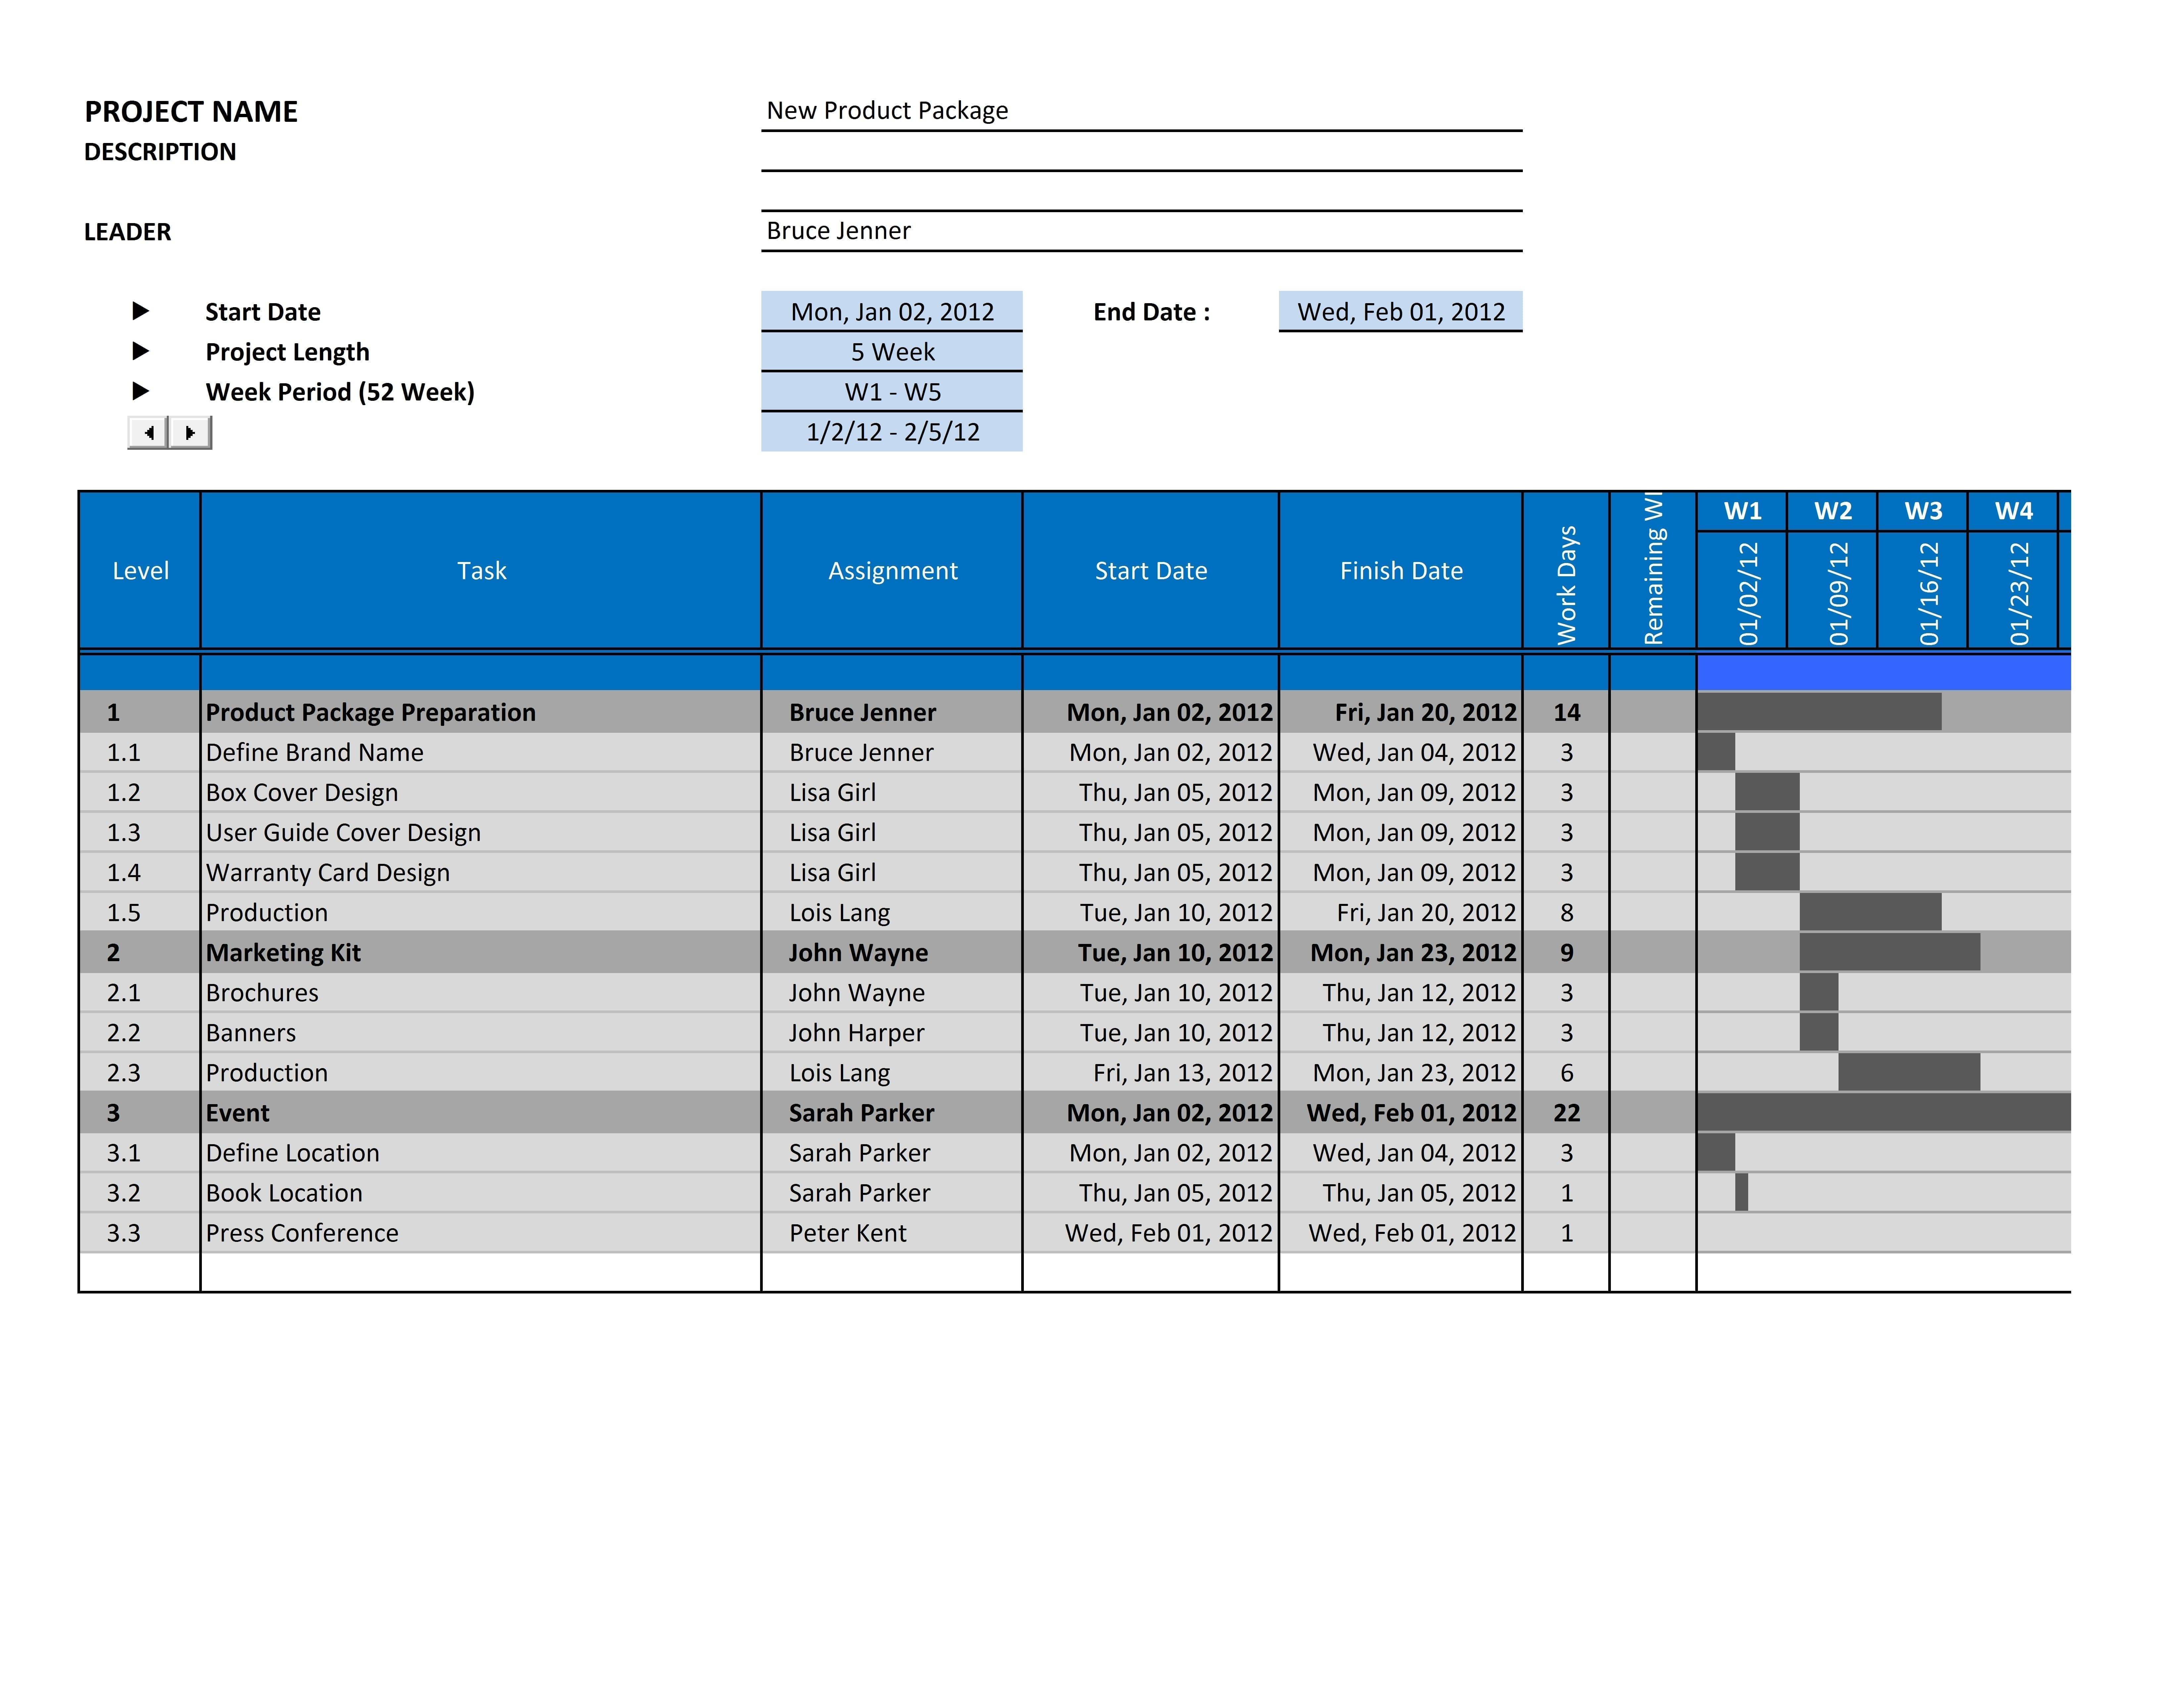 Gantt Chart Excel Template 2013 Excel Spreadsheet Gantt Chart Template Spreadsheet Templates for Busines Spreadsheet Templates for Busines Project Management Gantt Chart Excel